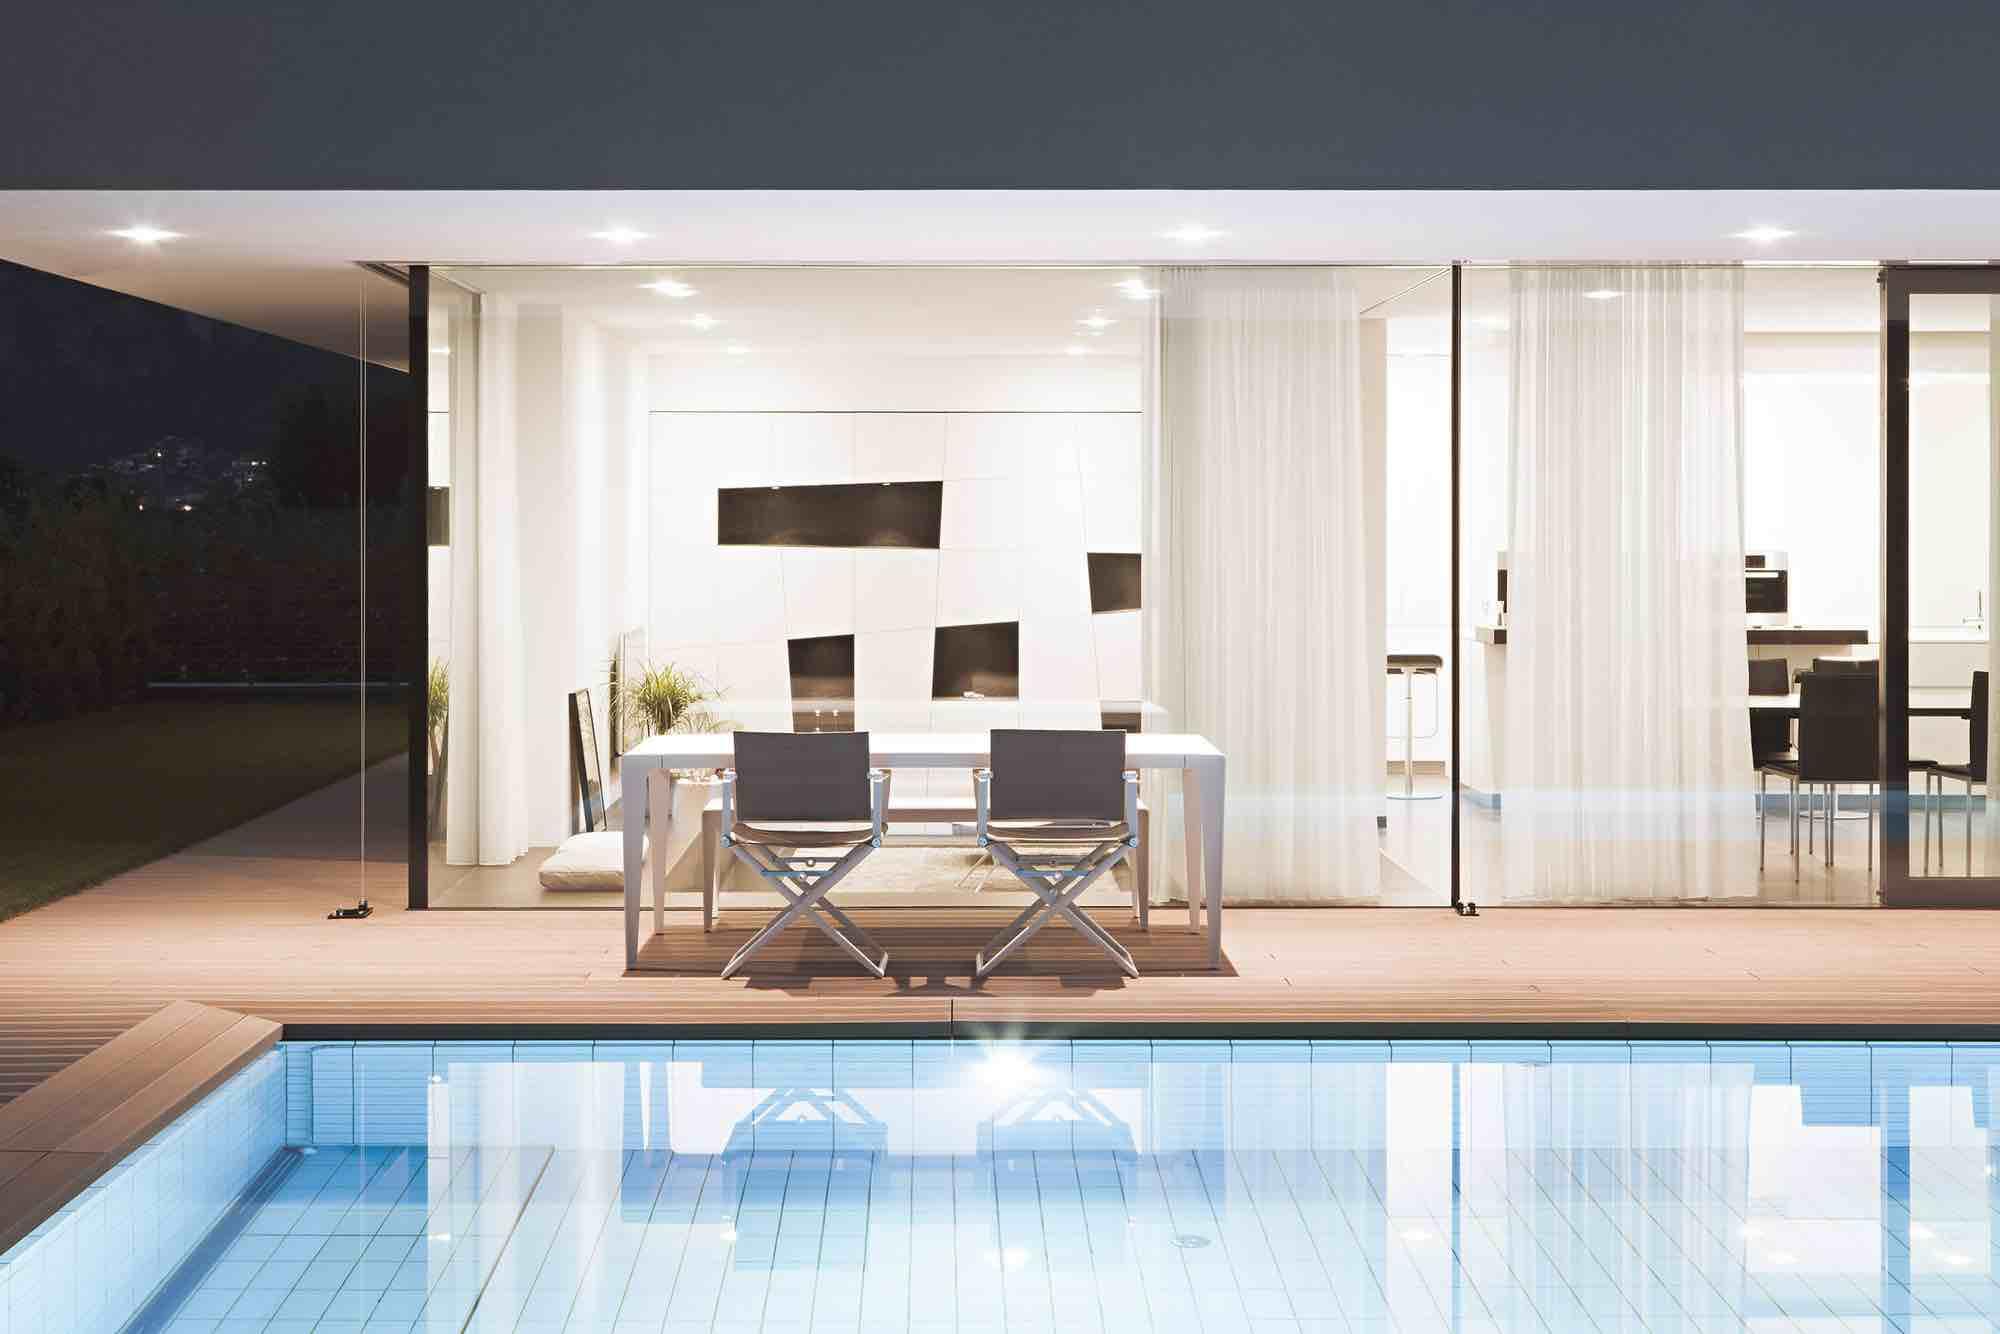 m2-house-monovolume-architecture-design_villa_moritzing_12